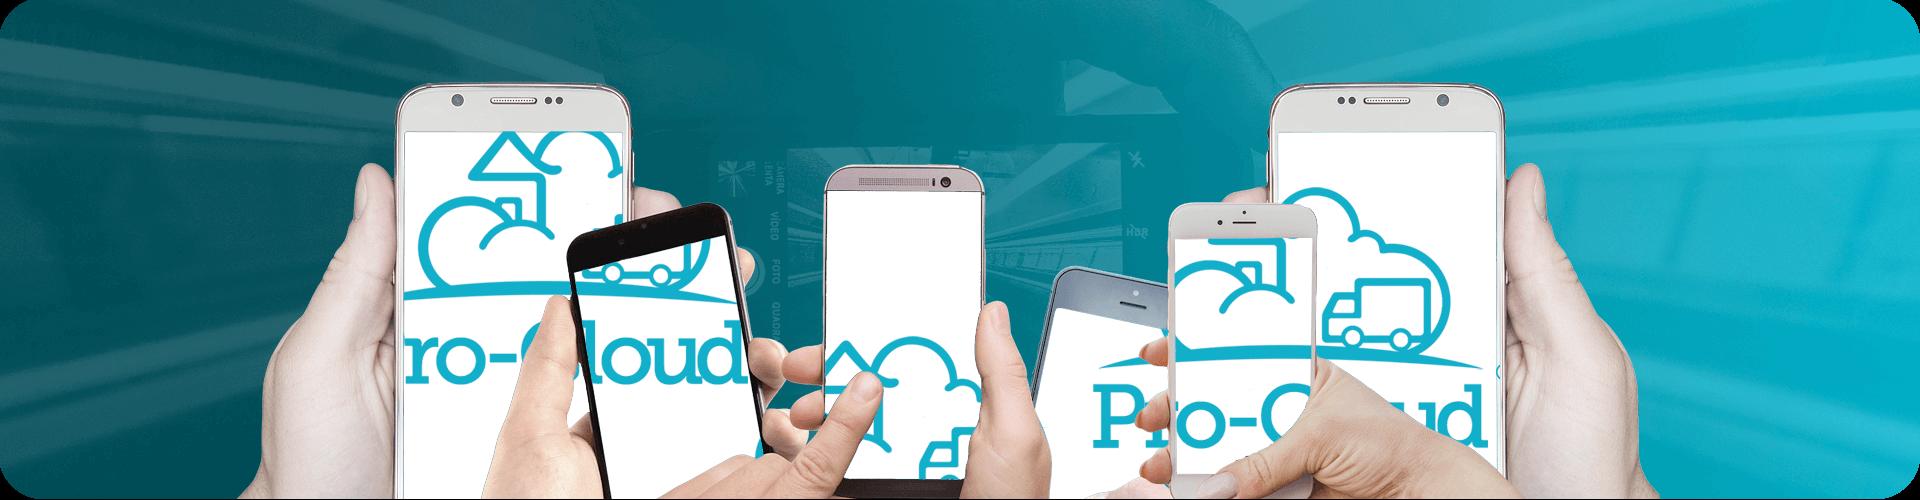 pro-cloud logo across mobile phones